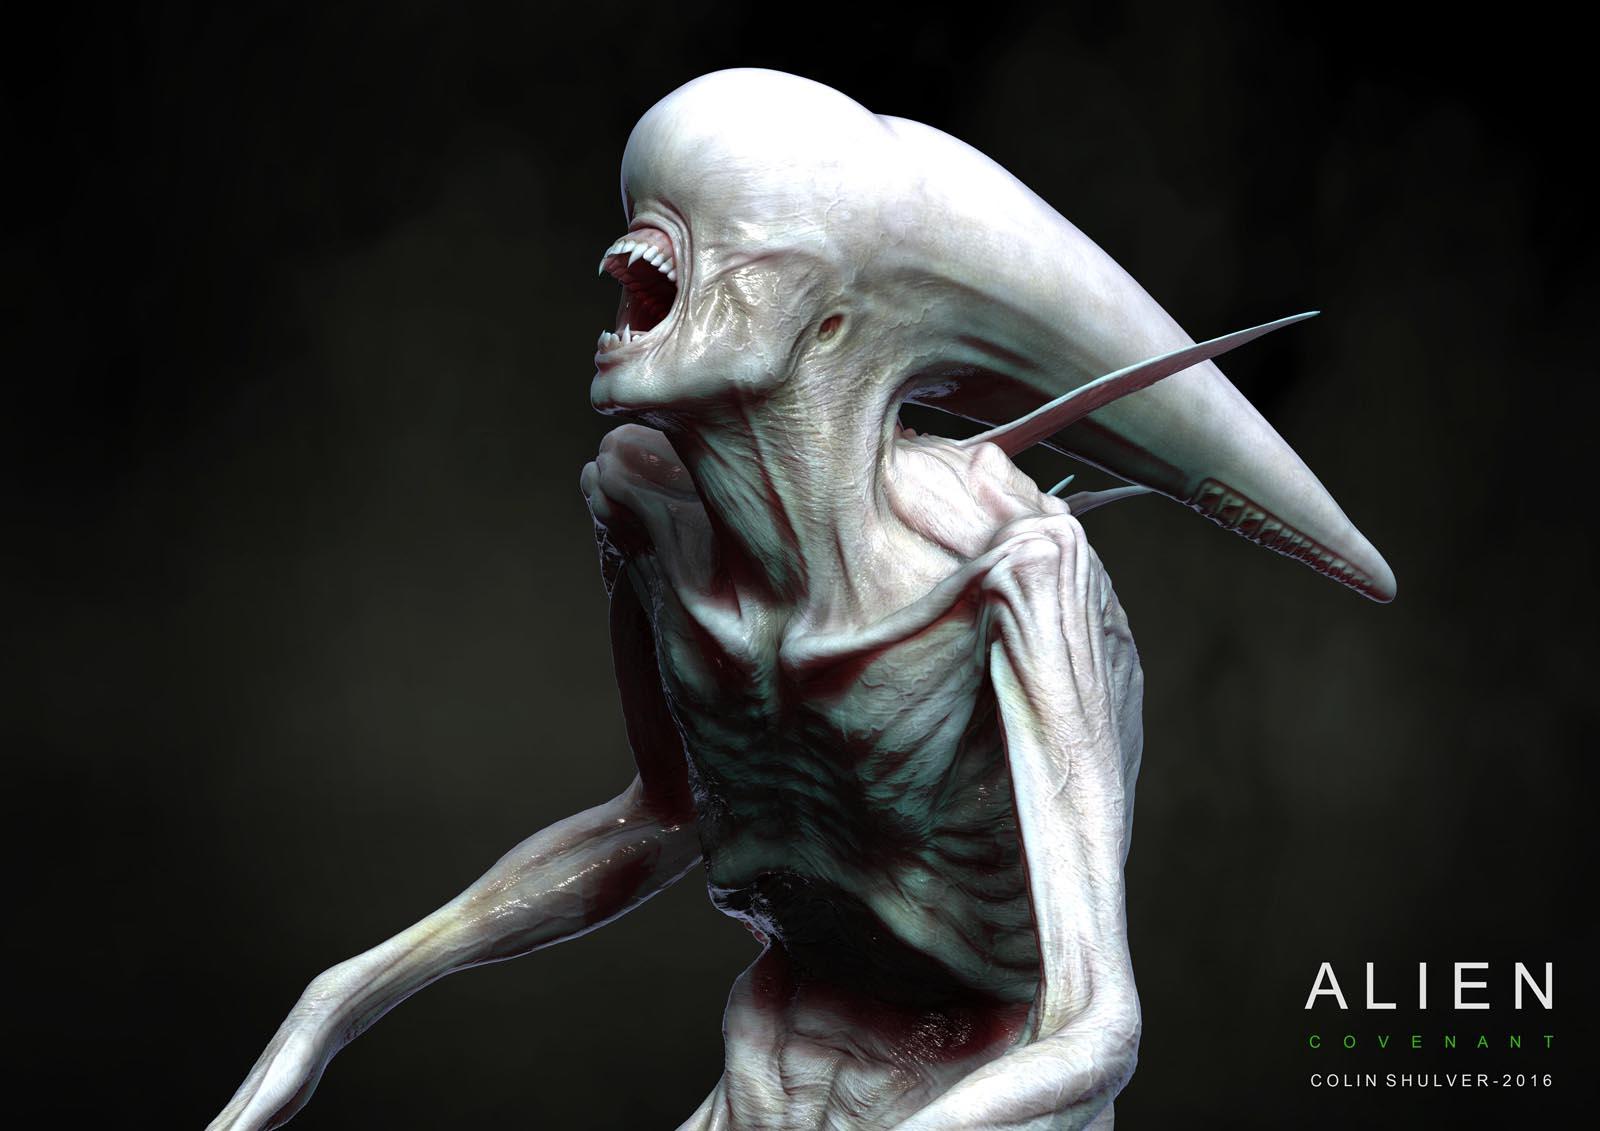 Alien Covenant Watch Online